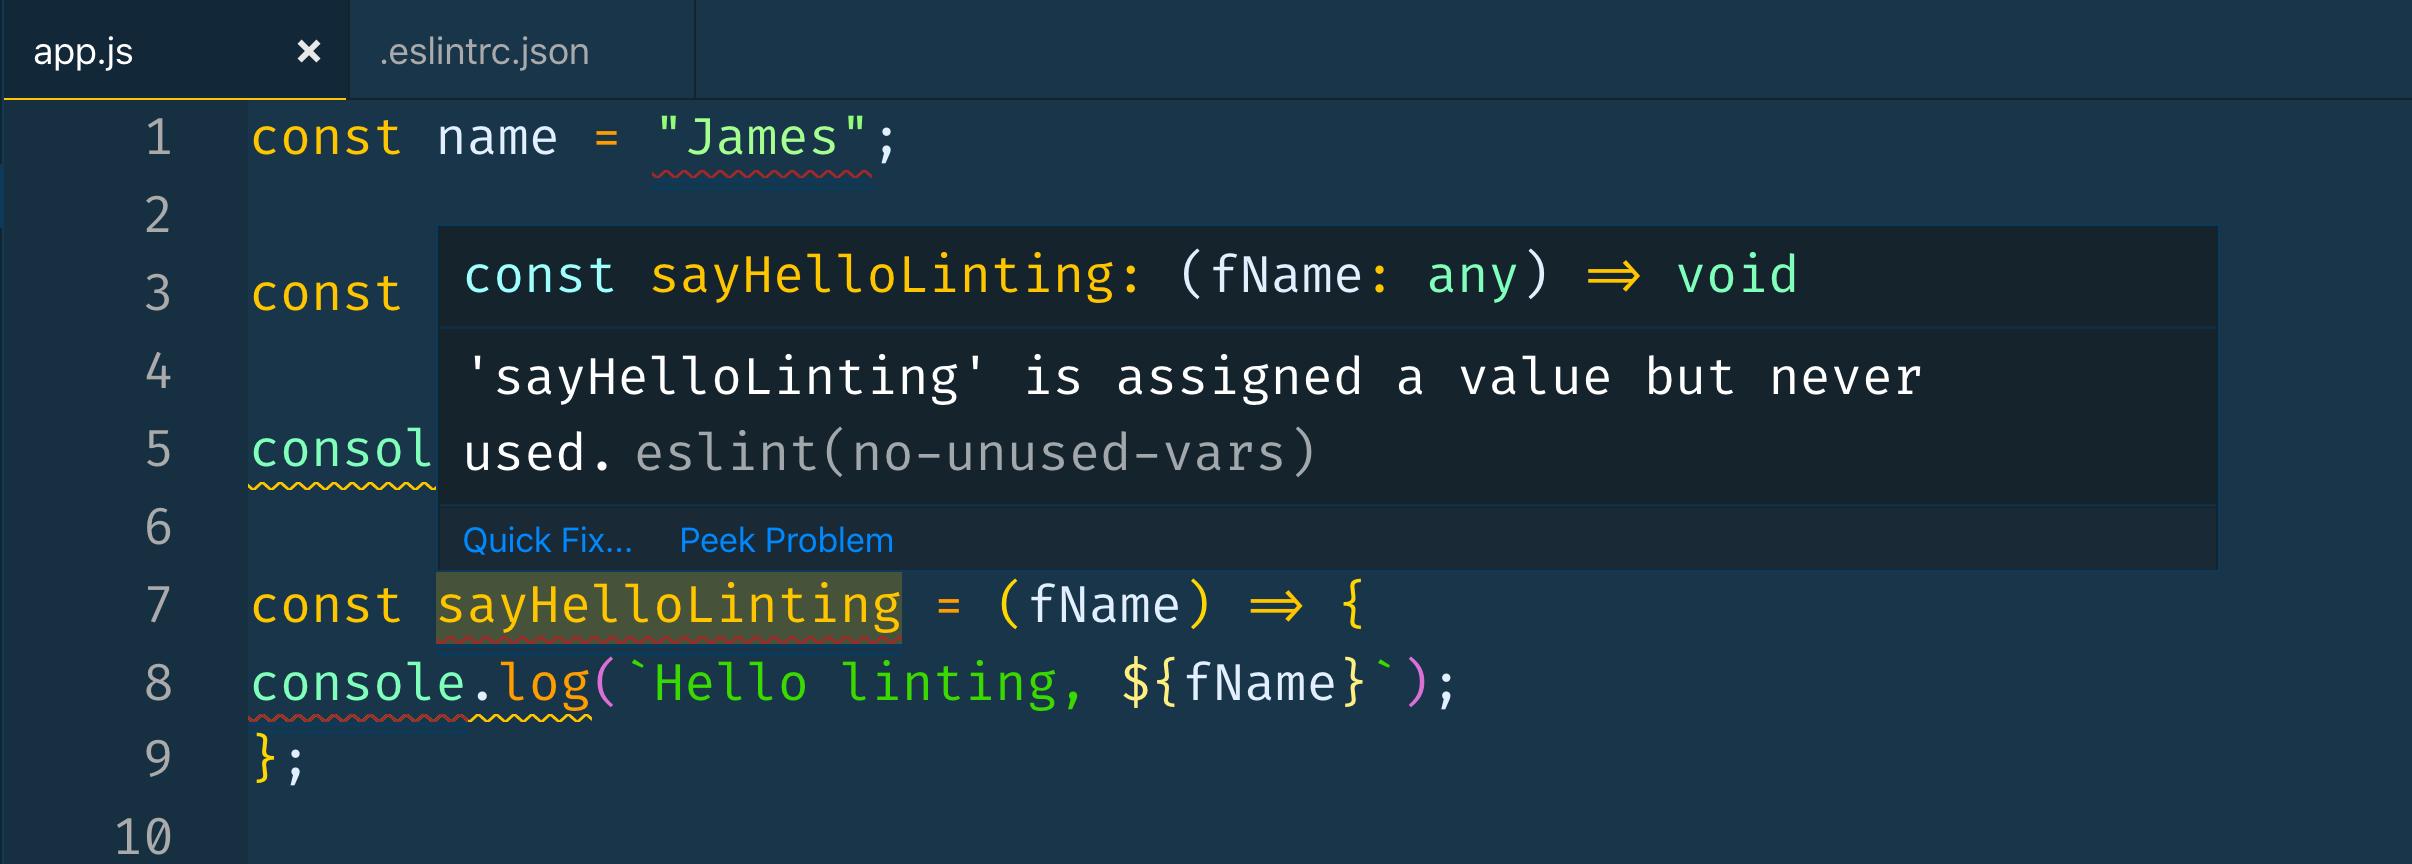 Unused code error